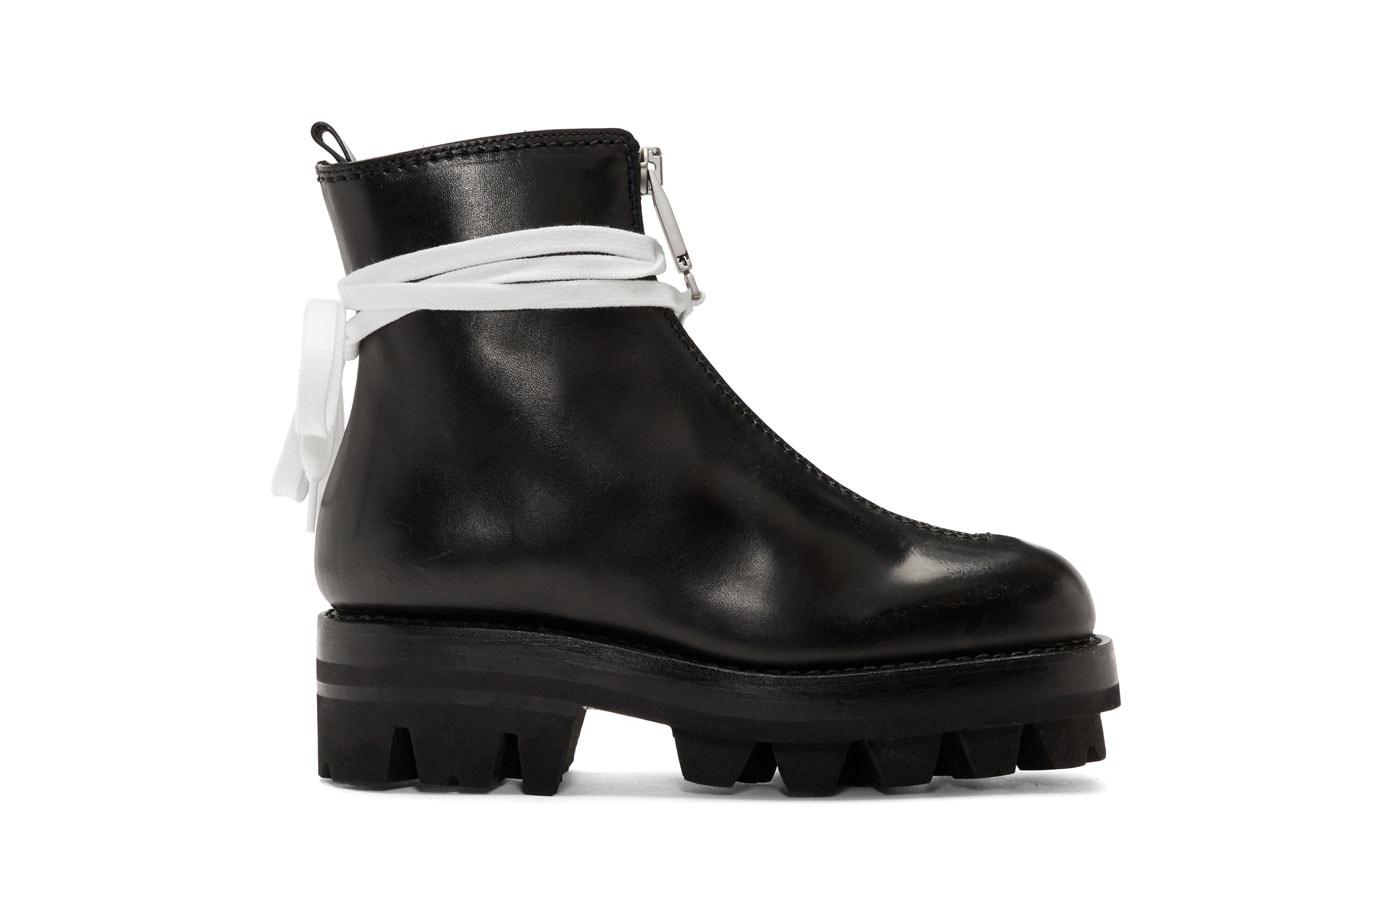 Louis Vuitton Archlight Boot